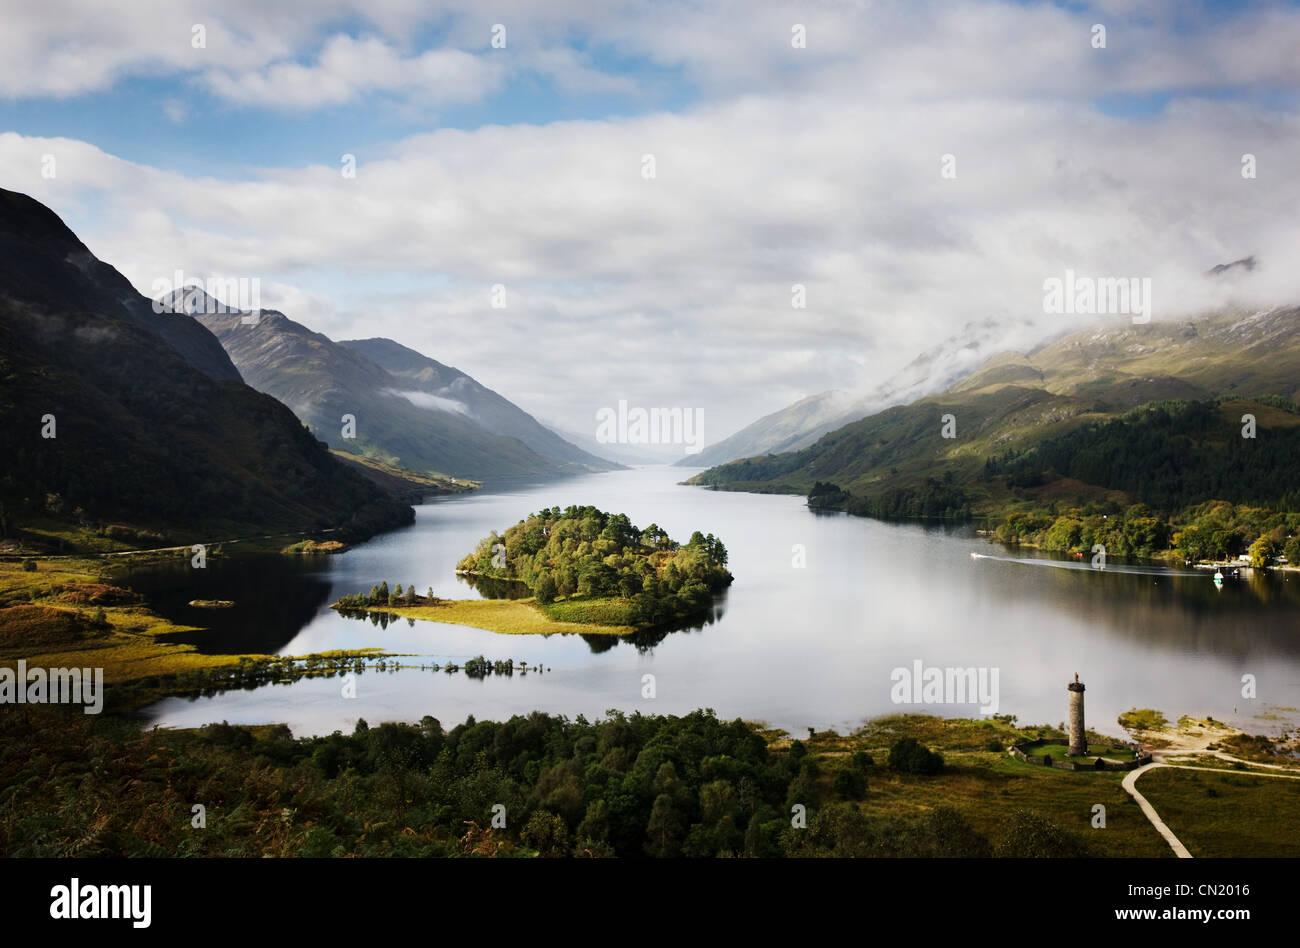 Misty Mountain et le lac, Ecosse, Royaume-Uni Photo Stock